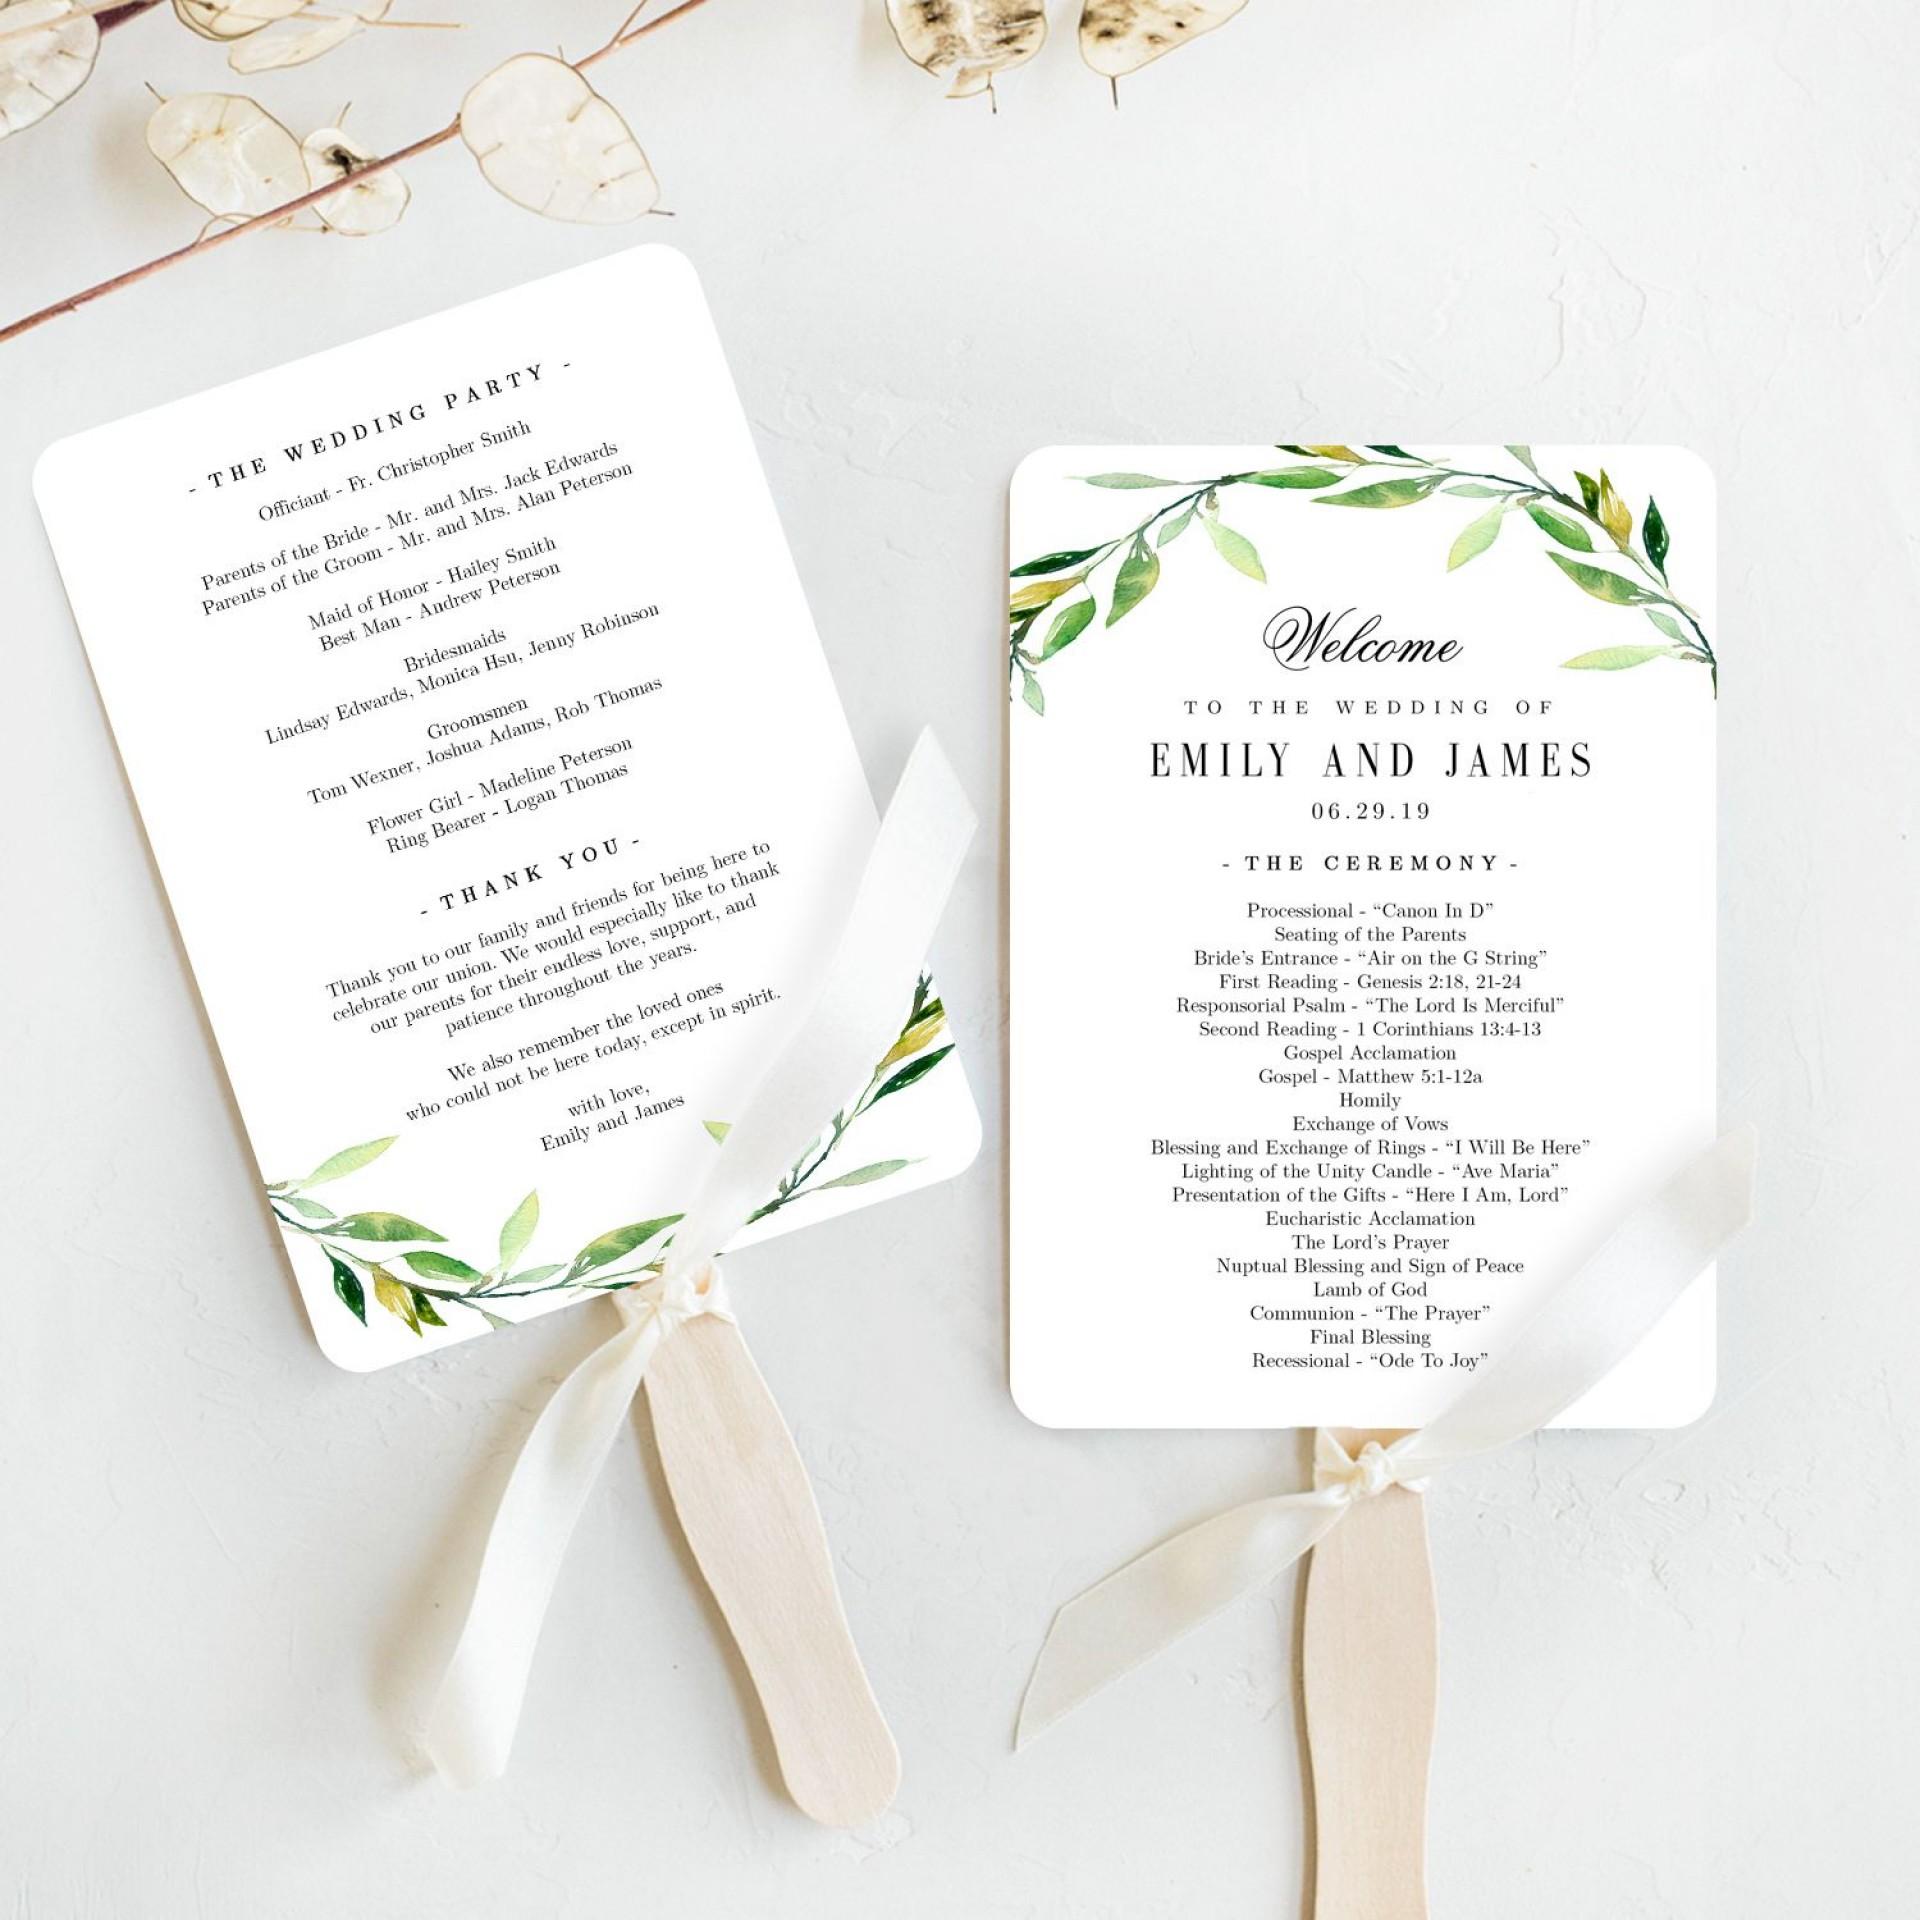 007 Shocking Free Wedding Ceremony Program Template Concept  Catholic Download1920